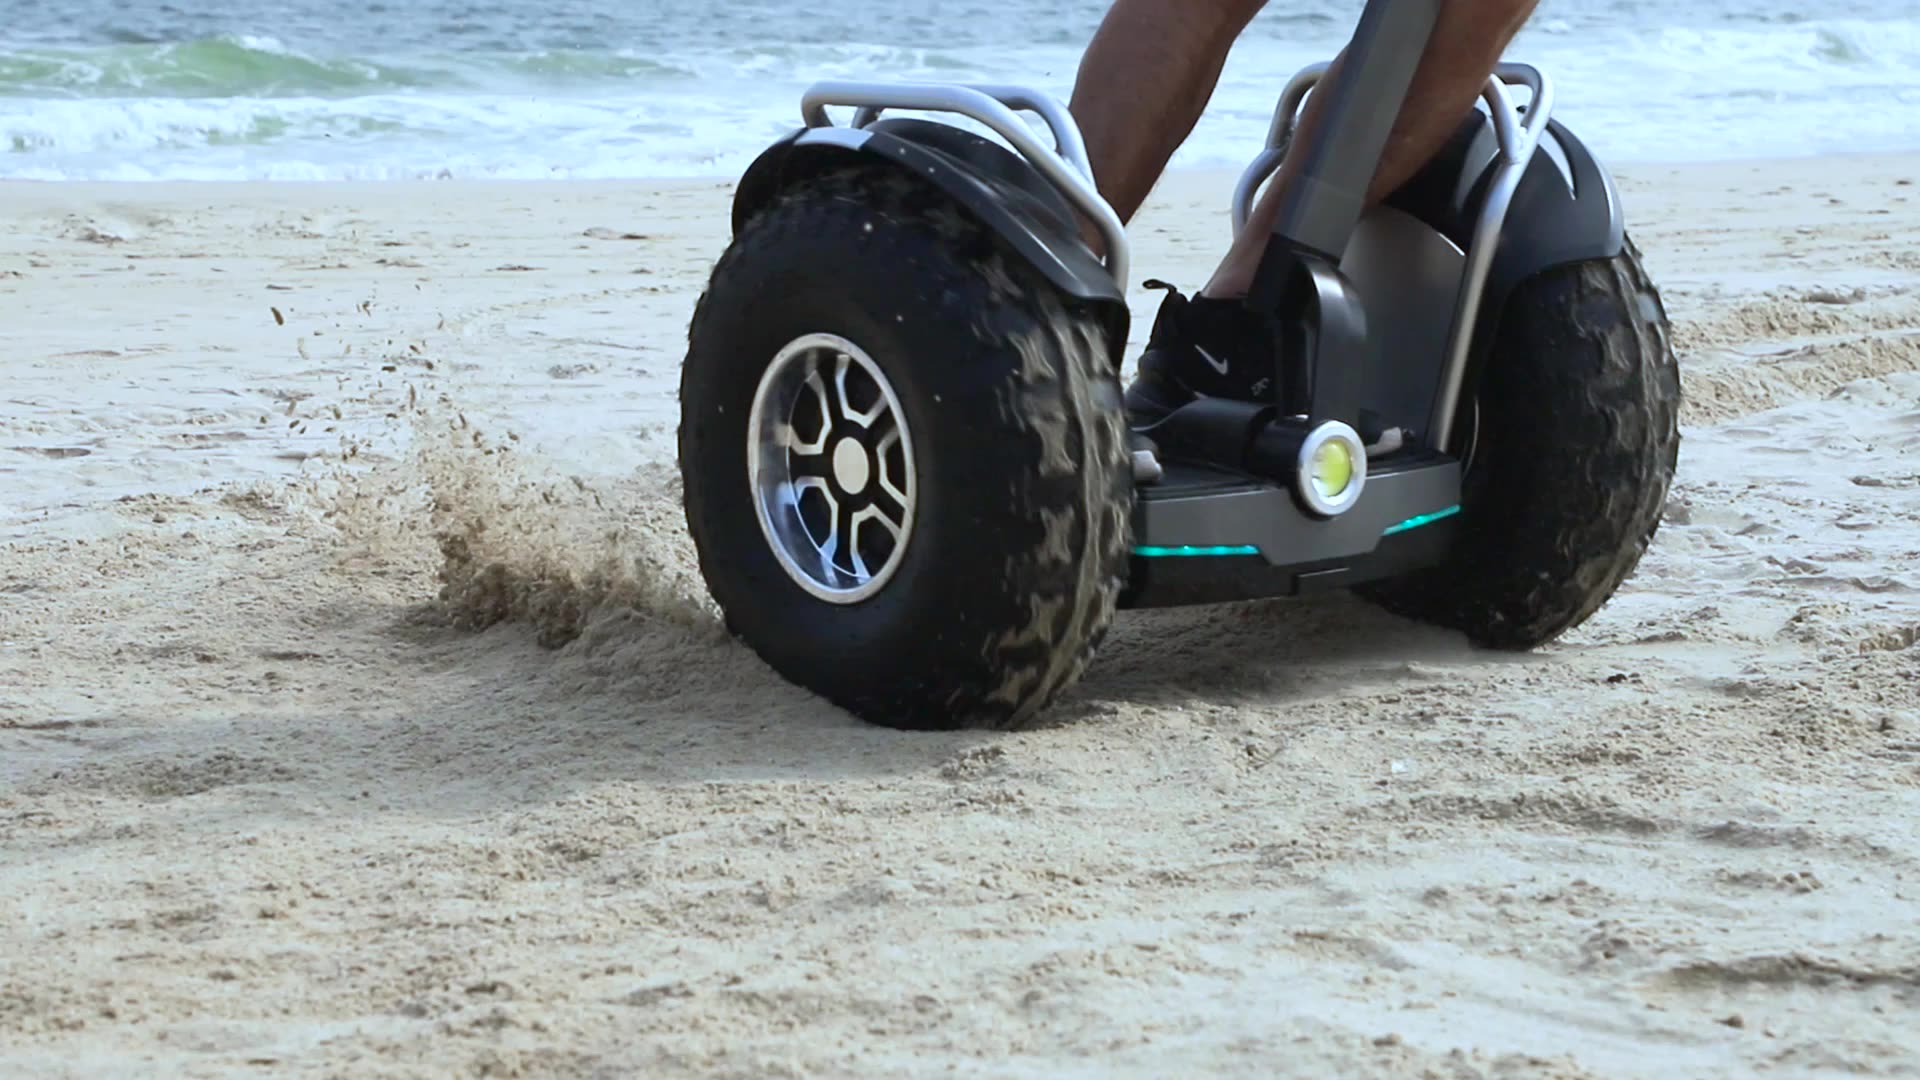 Angelol חדש 80KM ארוך טווח 19 אינץ שומן צמיג חשמלי מרכבה מכוסה קטנוע קטנוע סיור